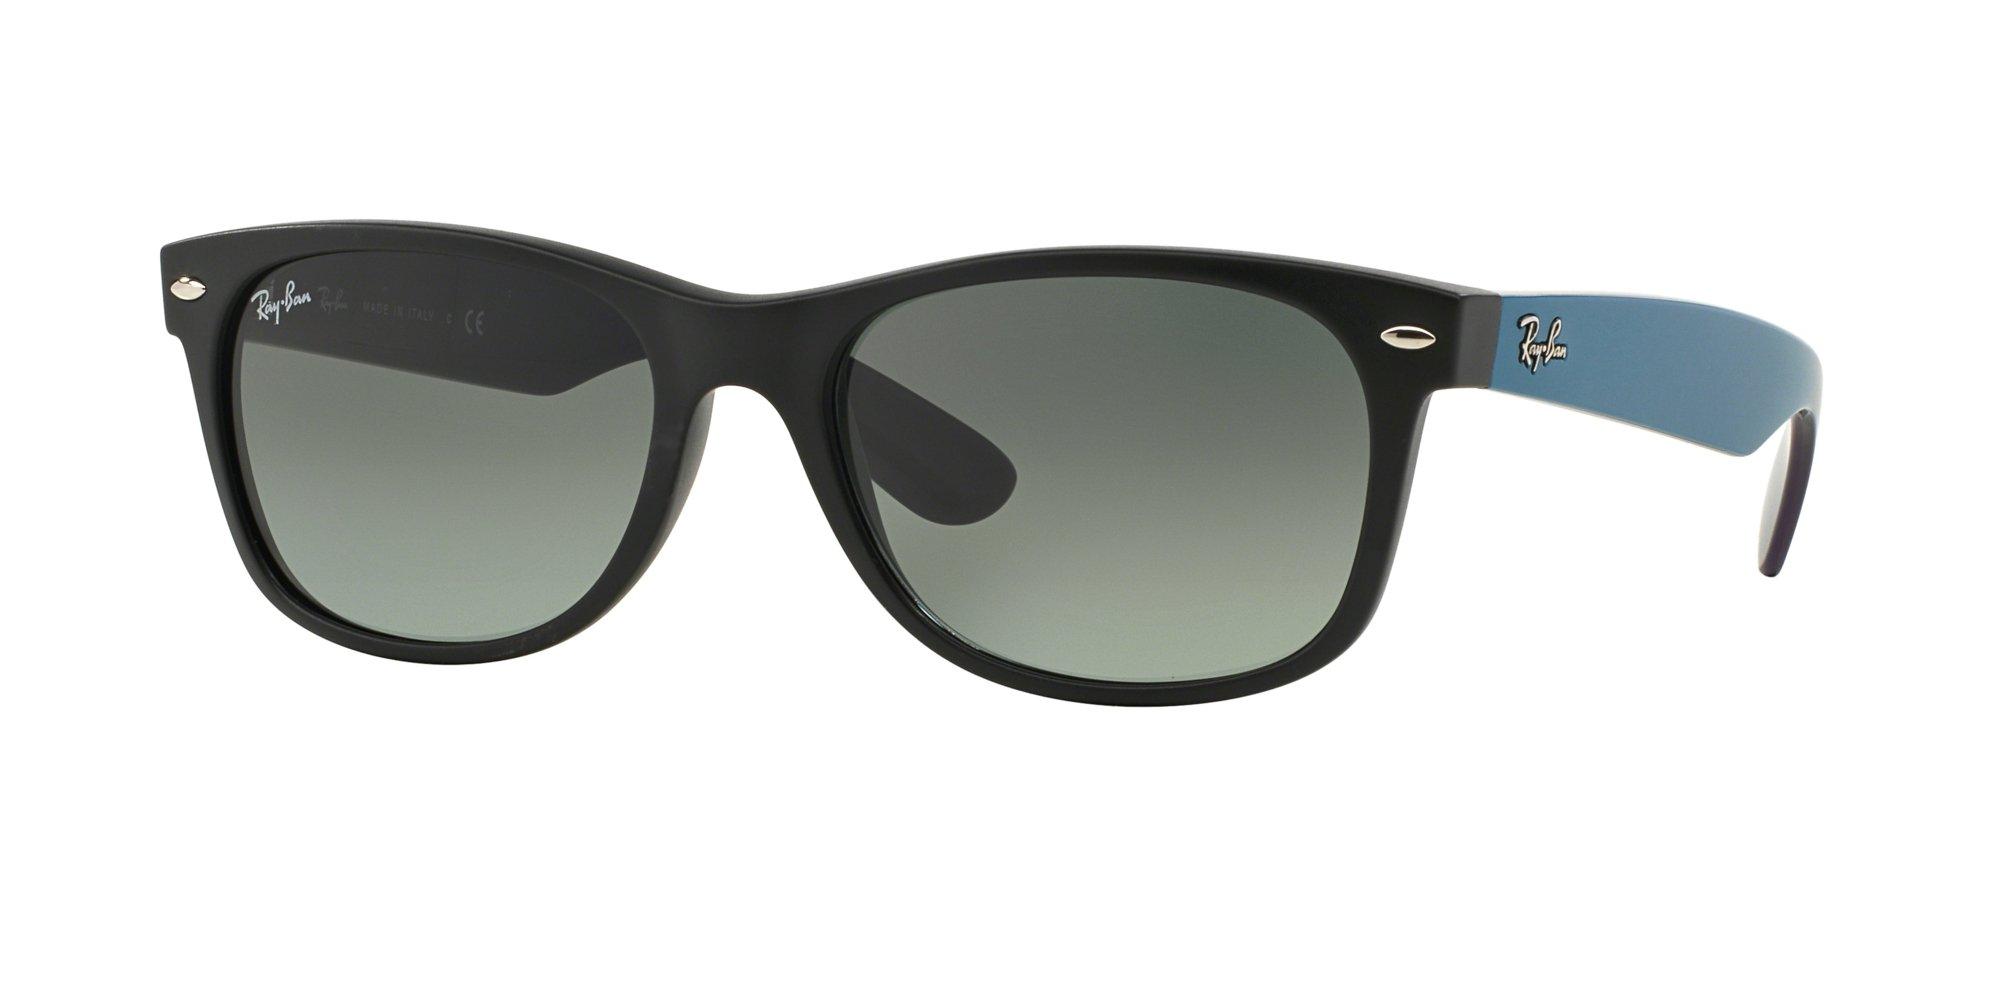 Ray Ban RB2132 NEW WAYFARER 618371 55M Matte Black/Grey Gradient Dark Grey Sunglasses For Men For Women